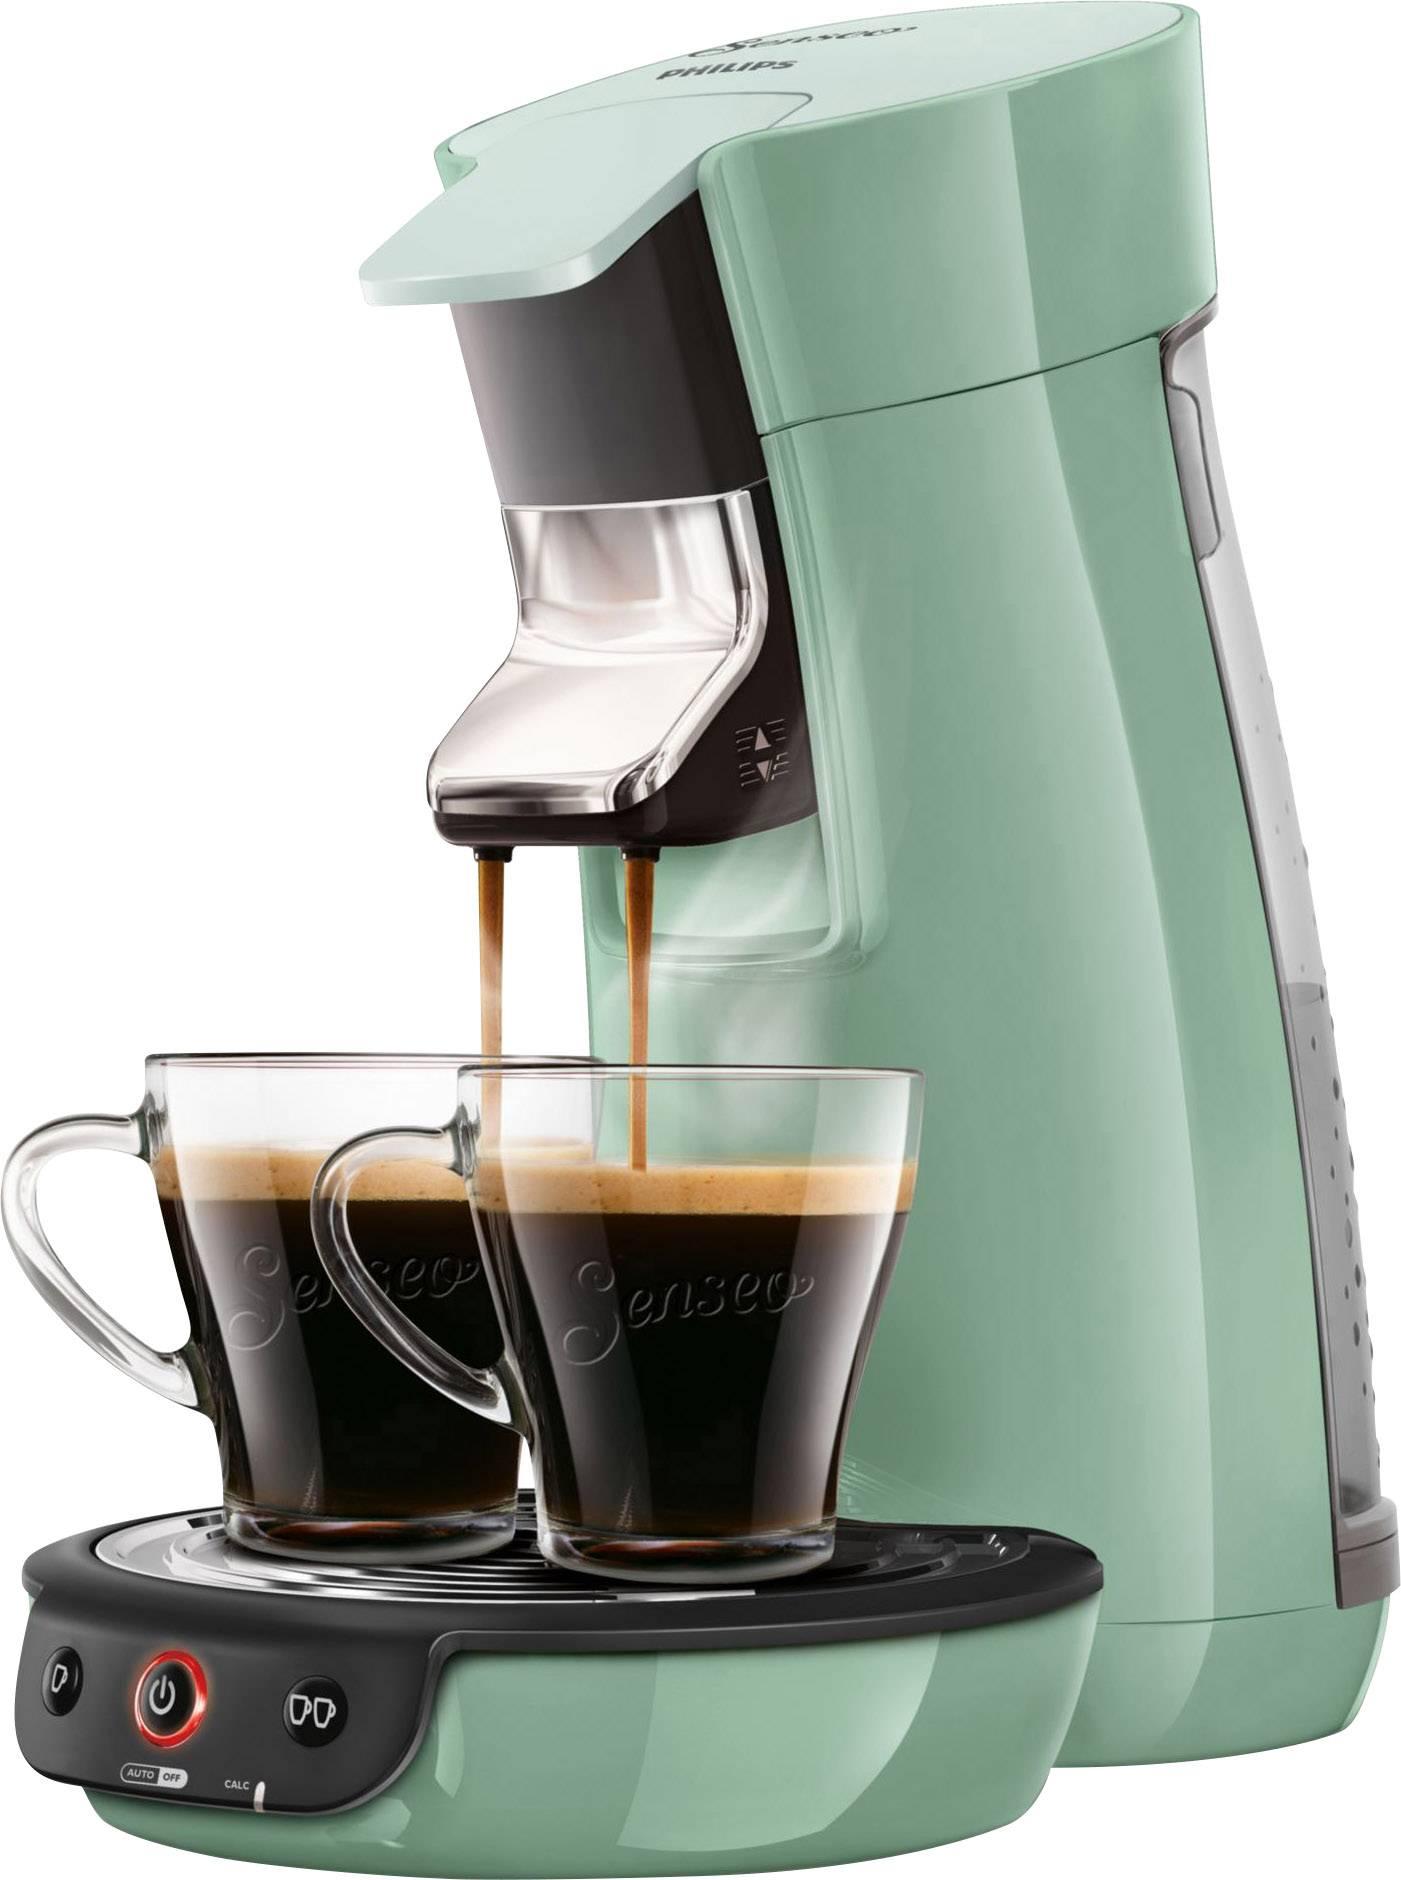 Senseo Viva Café Hd782910 Pod Coffee Machine Mint Green